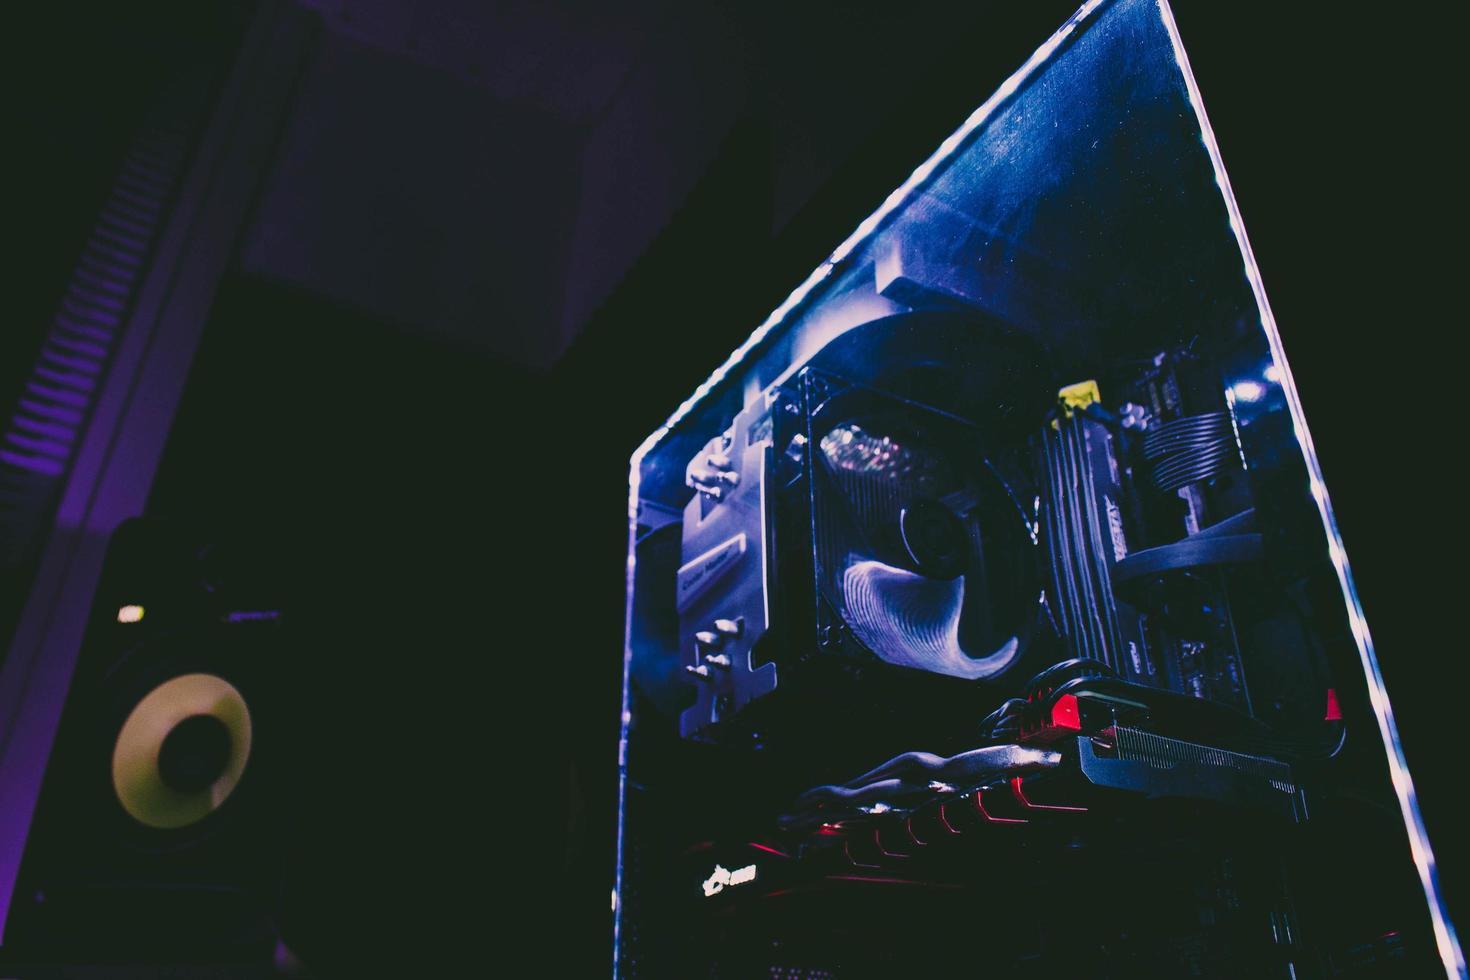 dentro de una torre de computadoras foto